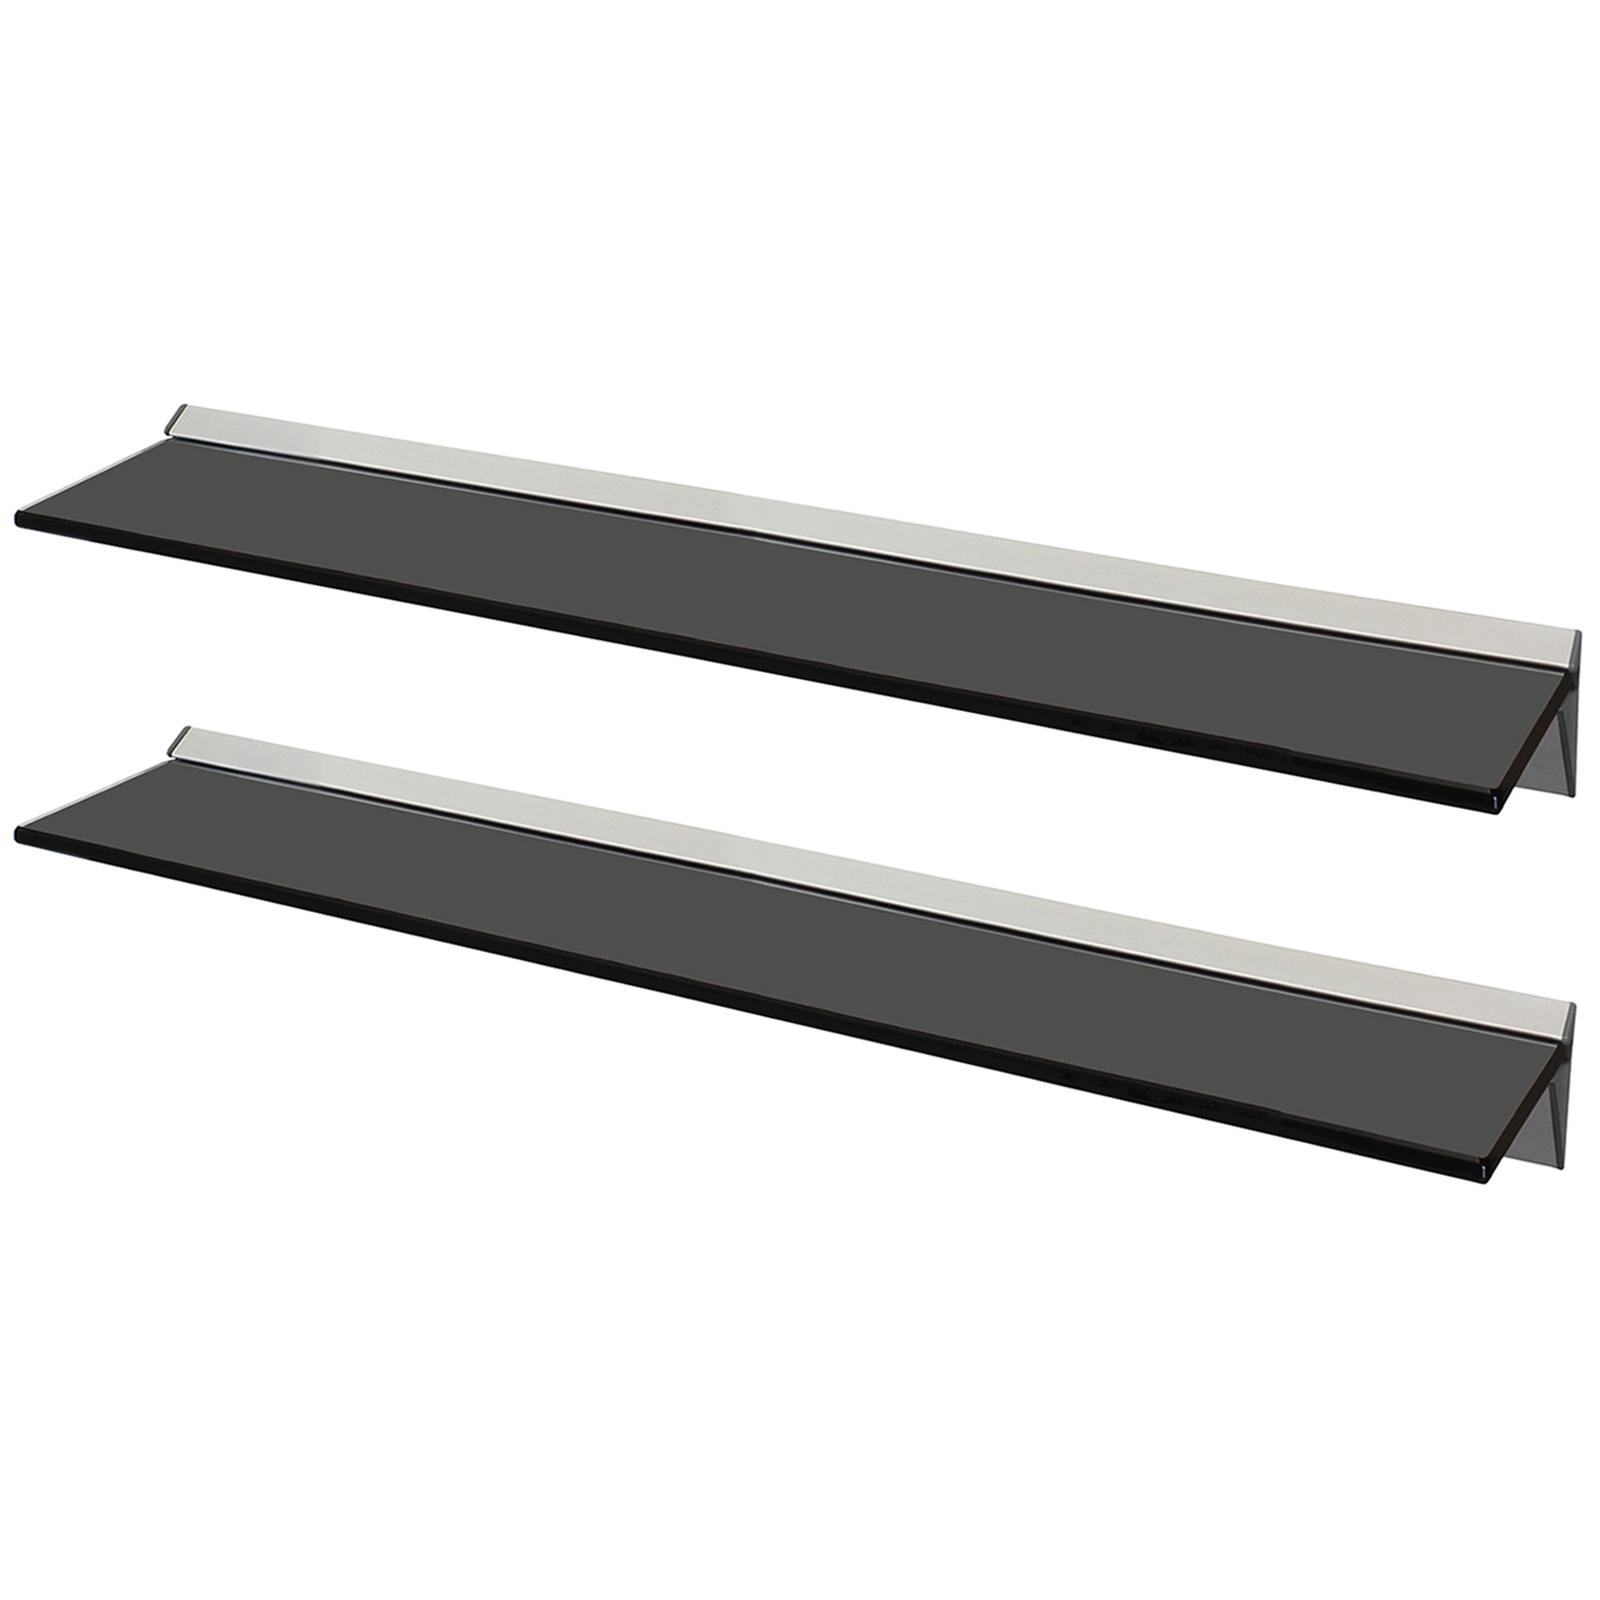 Sentinel hartleys pair 80x15cm black floating glass wall shelves storage display shelf